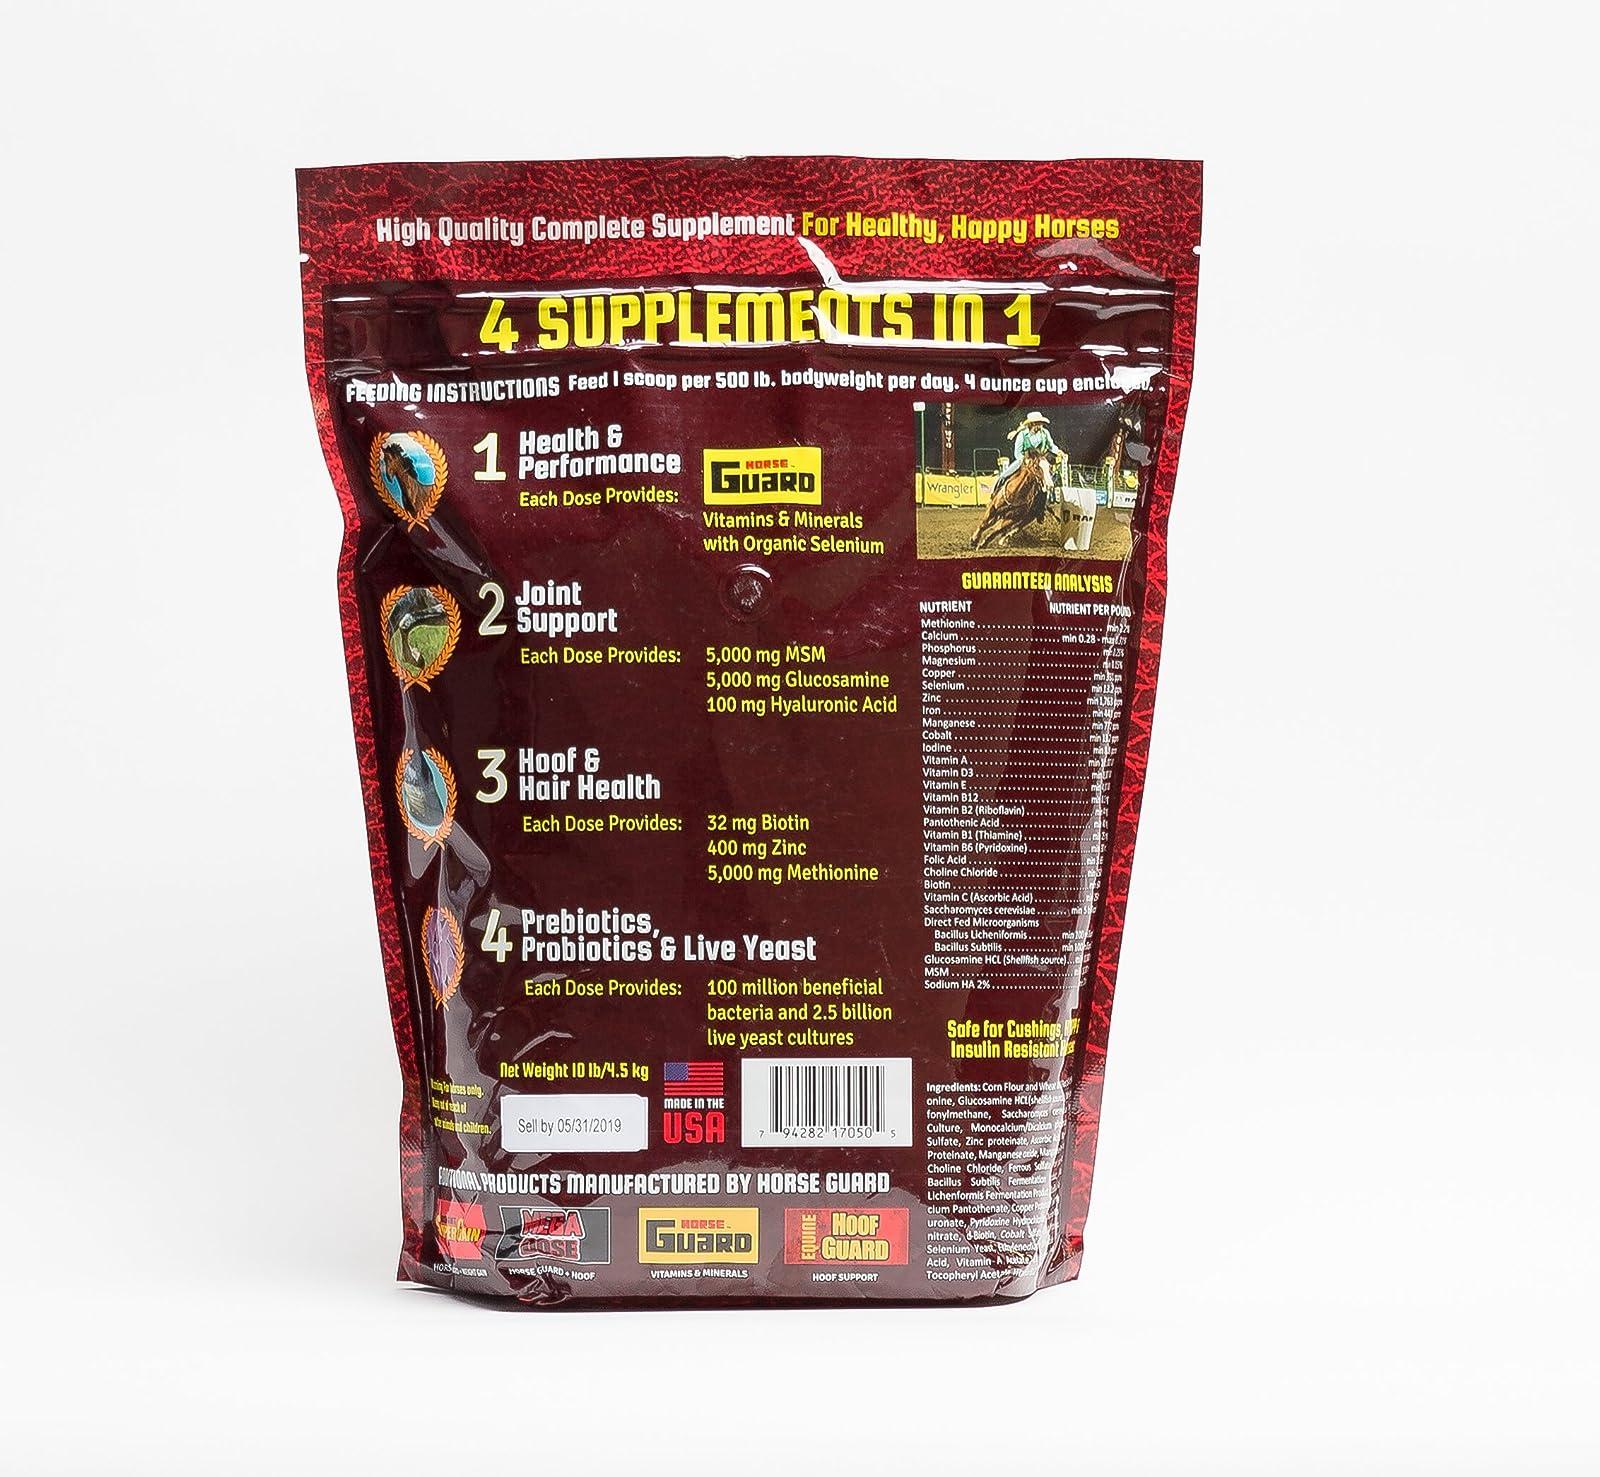 Horse Guard Trifecta Equine Vitamin Mineral Joint Trifecta 10lb bag - 1